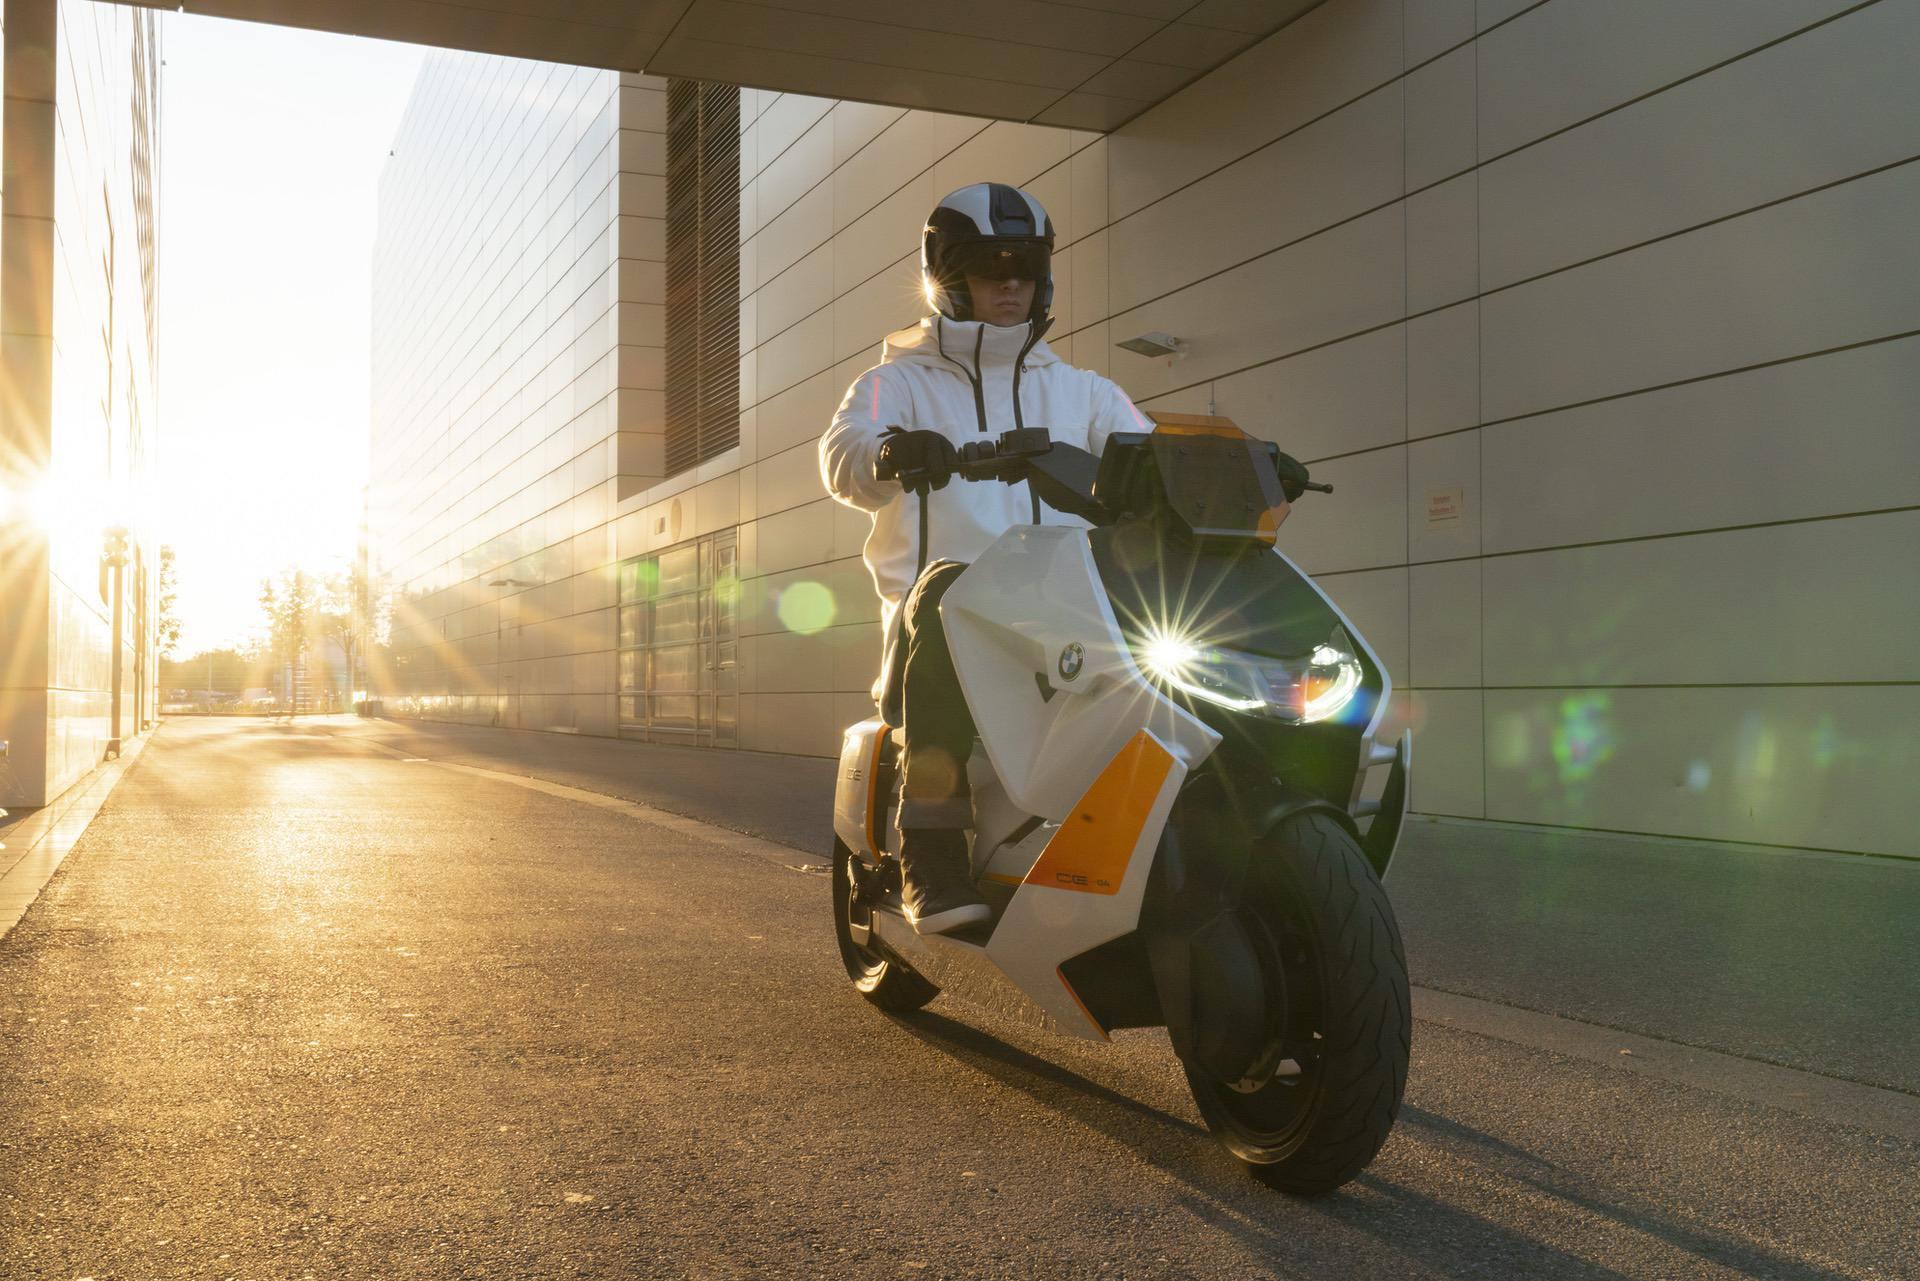 BMW Motorrad Definition CE 04 00